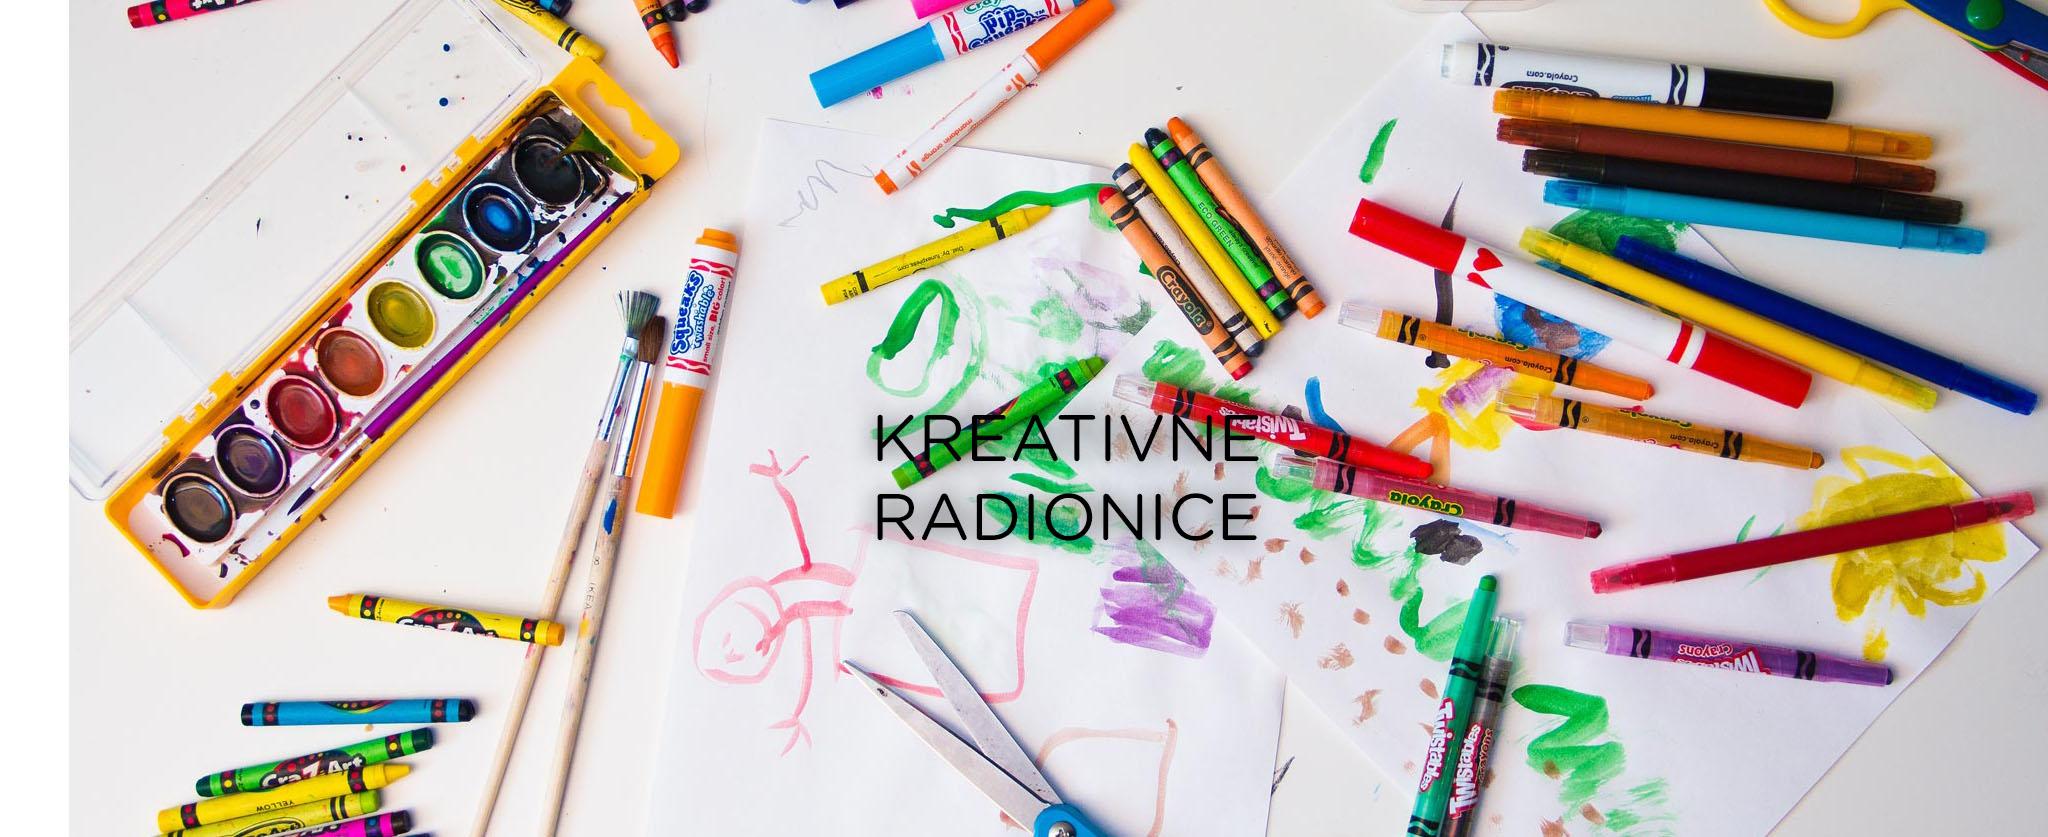 Kreativne_Radionice_v001_slider